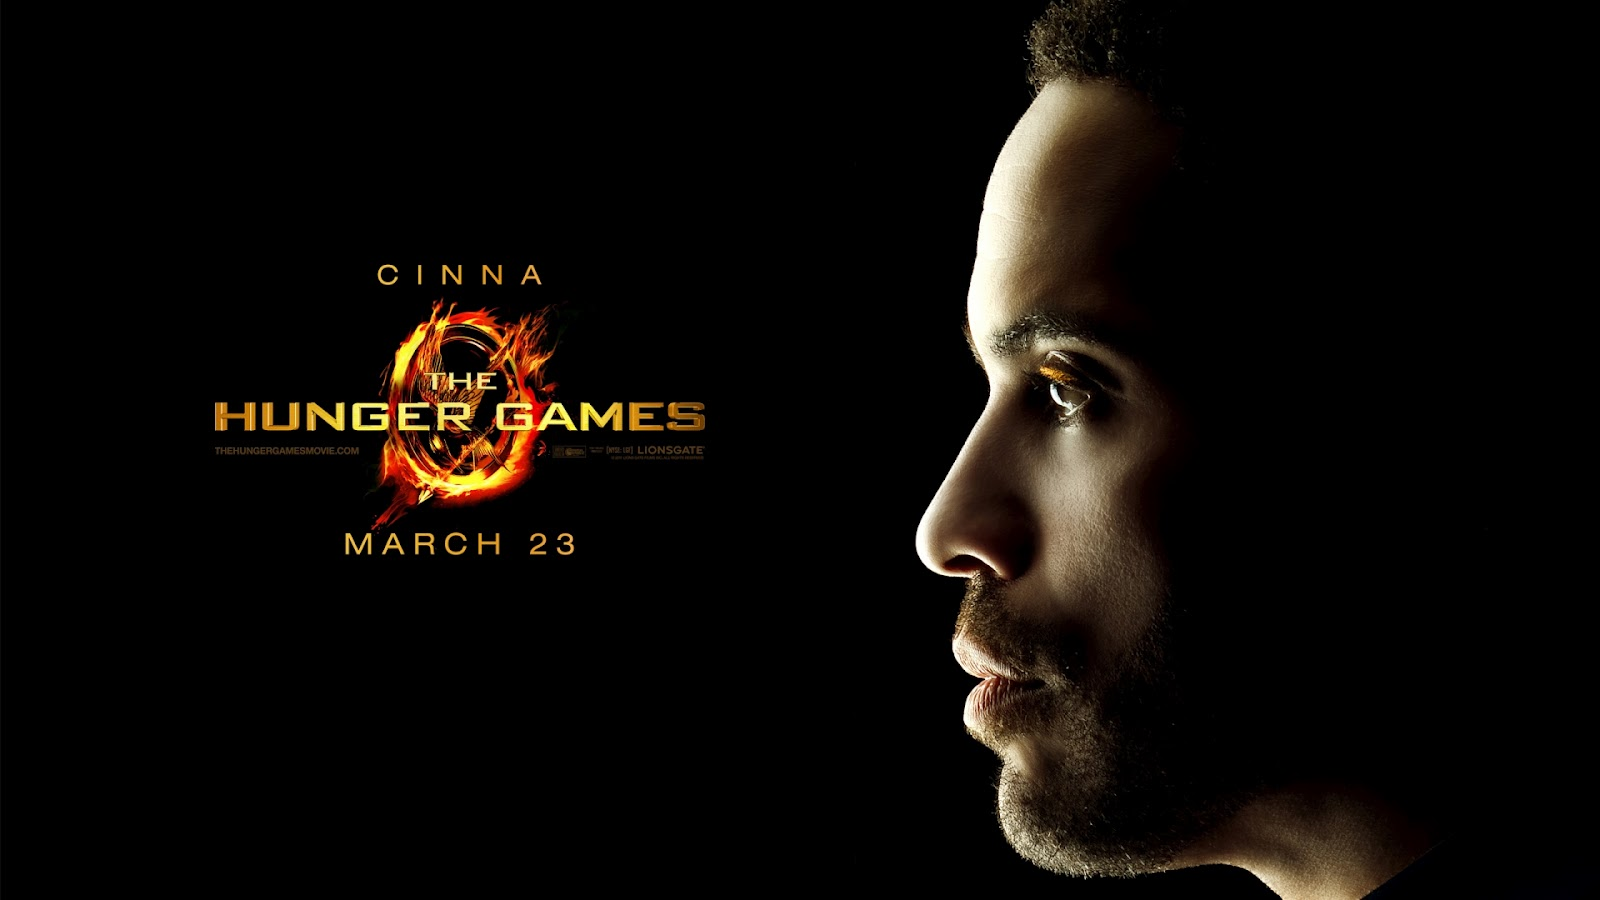 The Hunger Games wallpaper 12